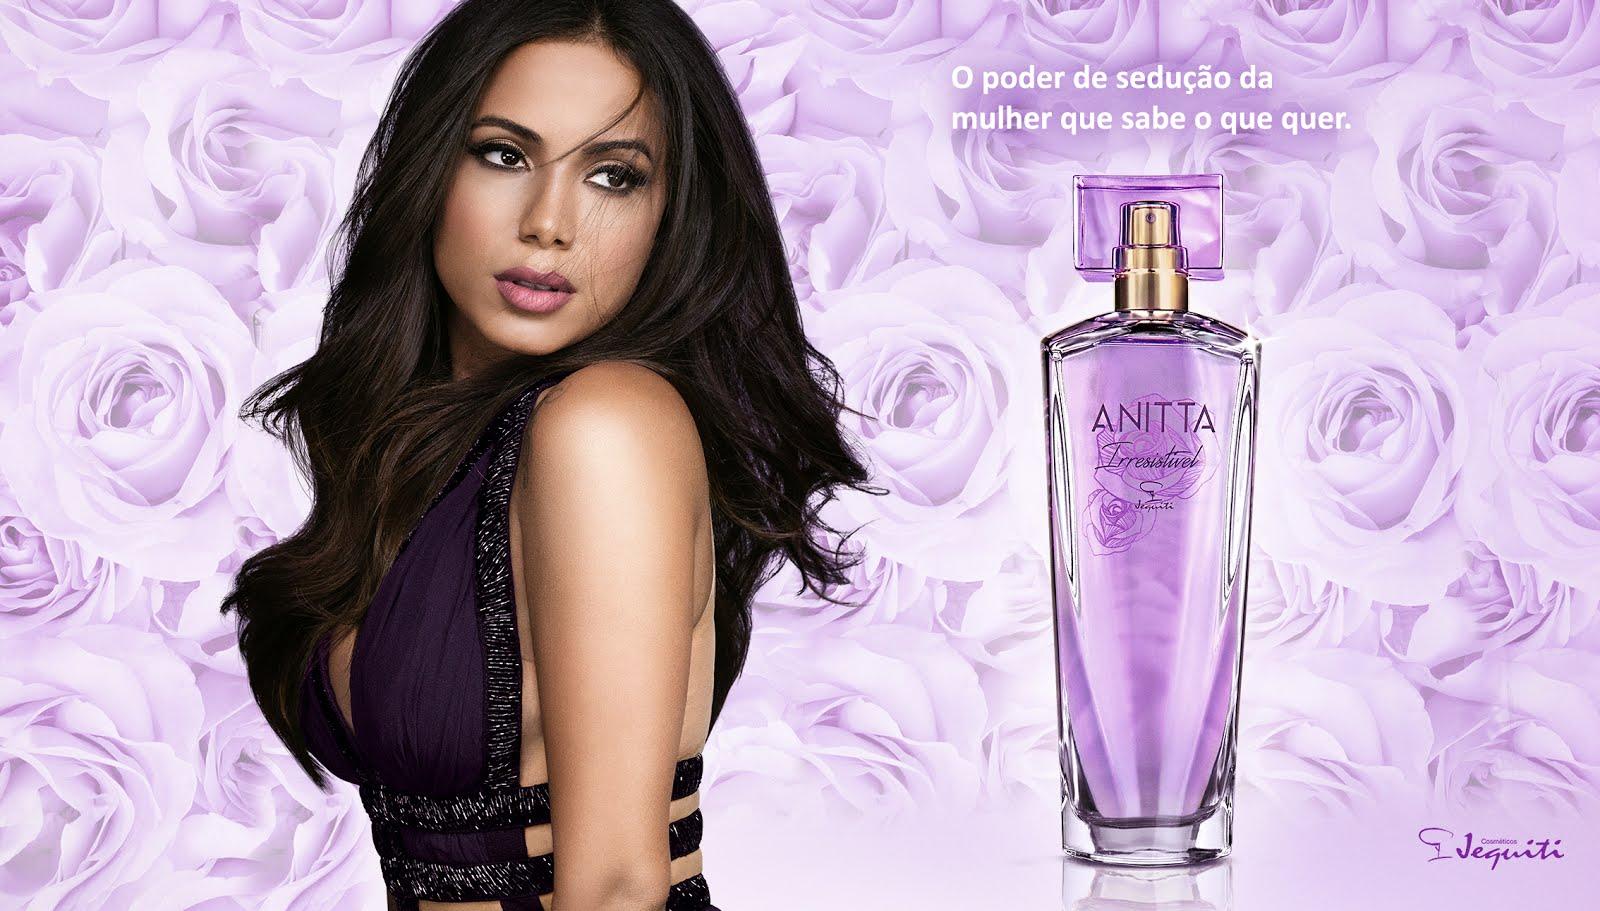 Perfume Anitta - Blog Cris Felix